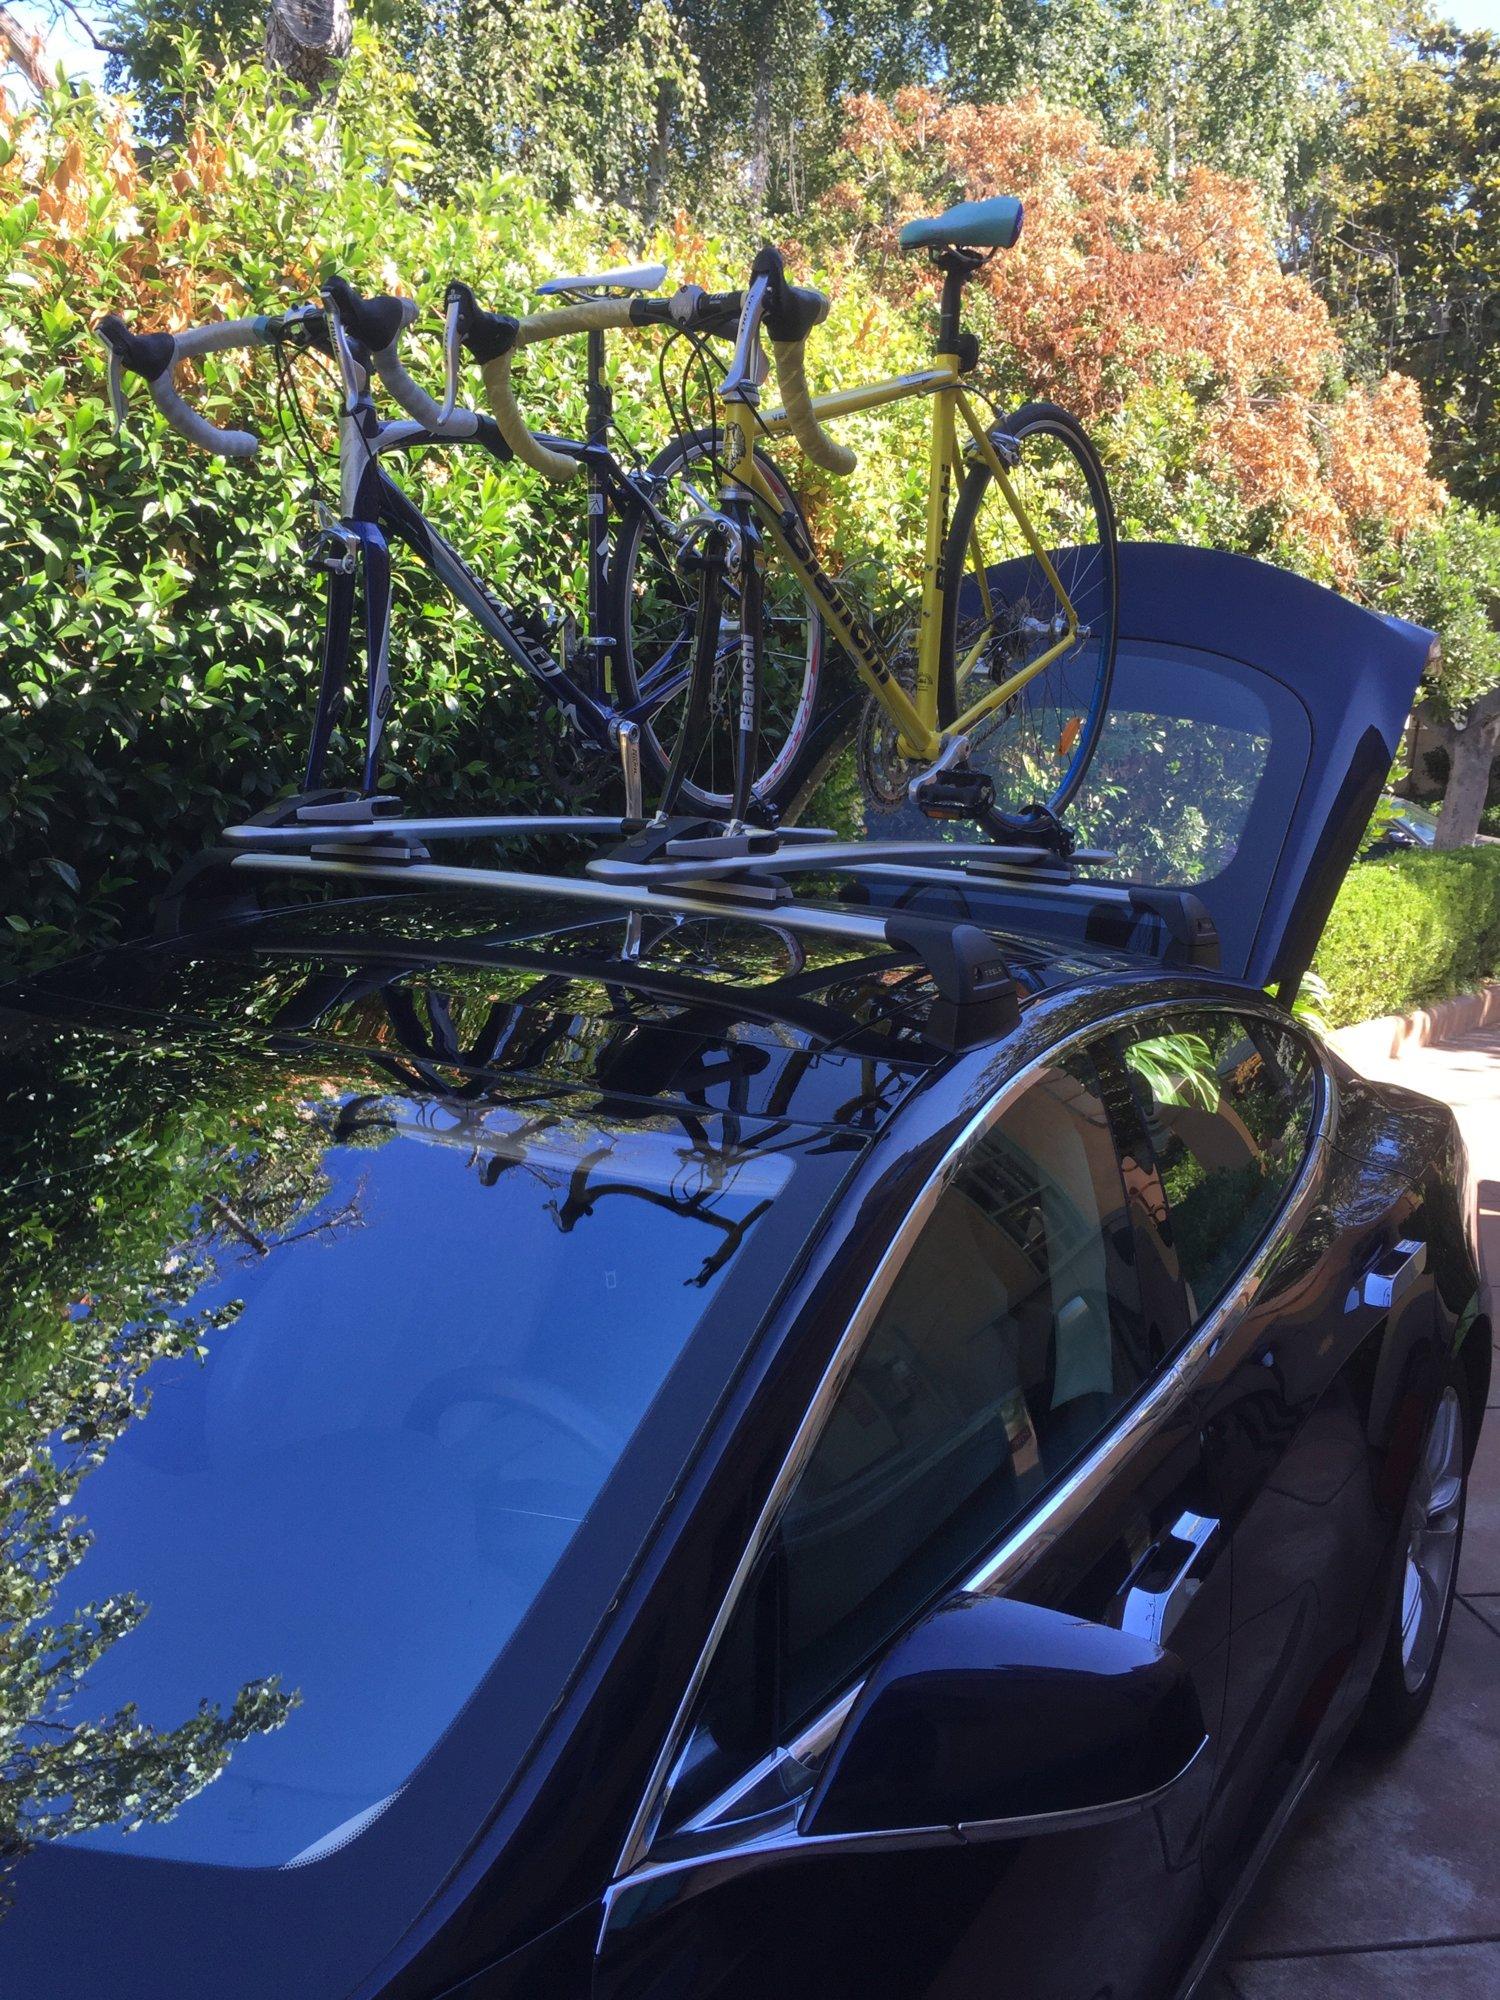 Bikes on Car.jpg